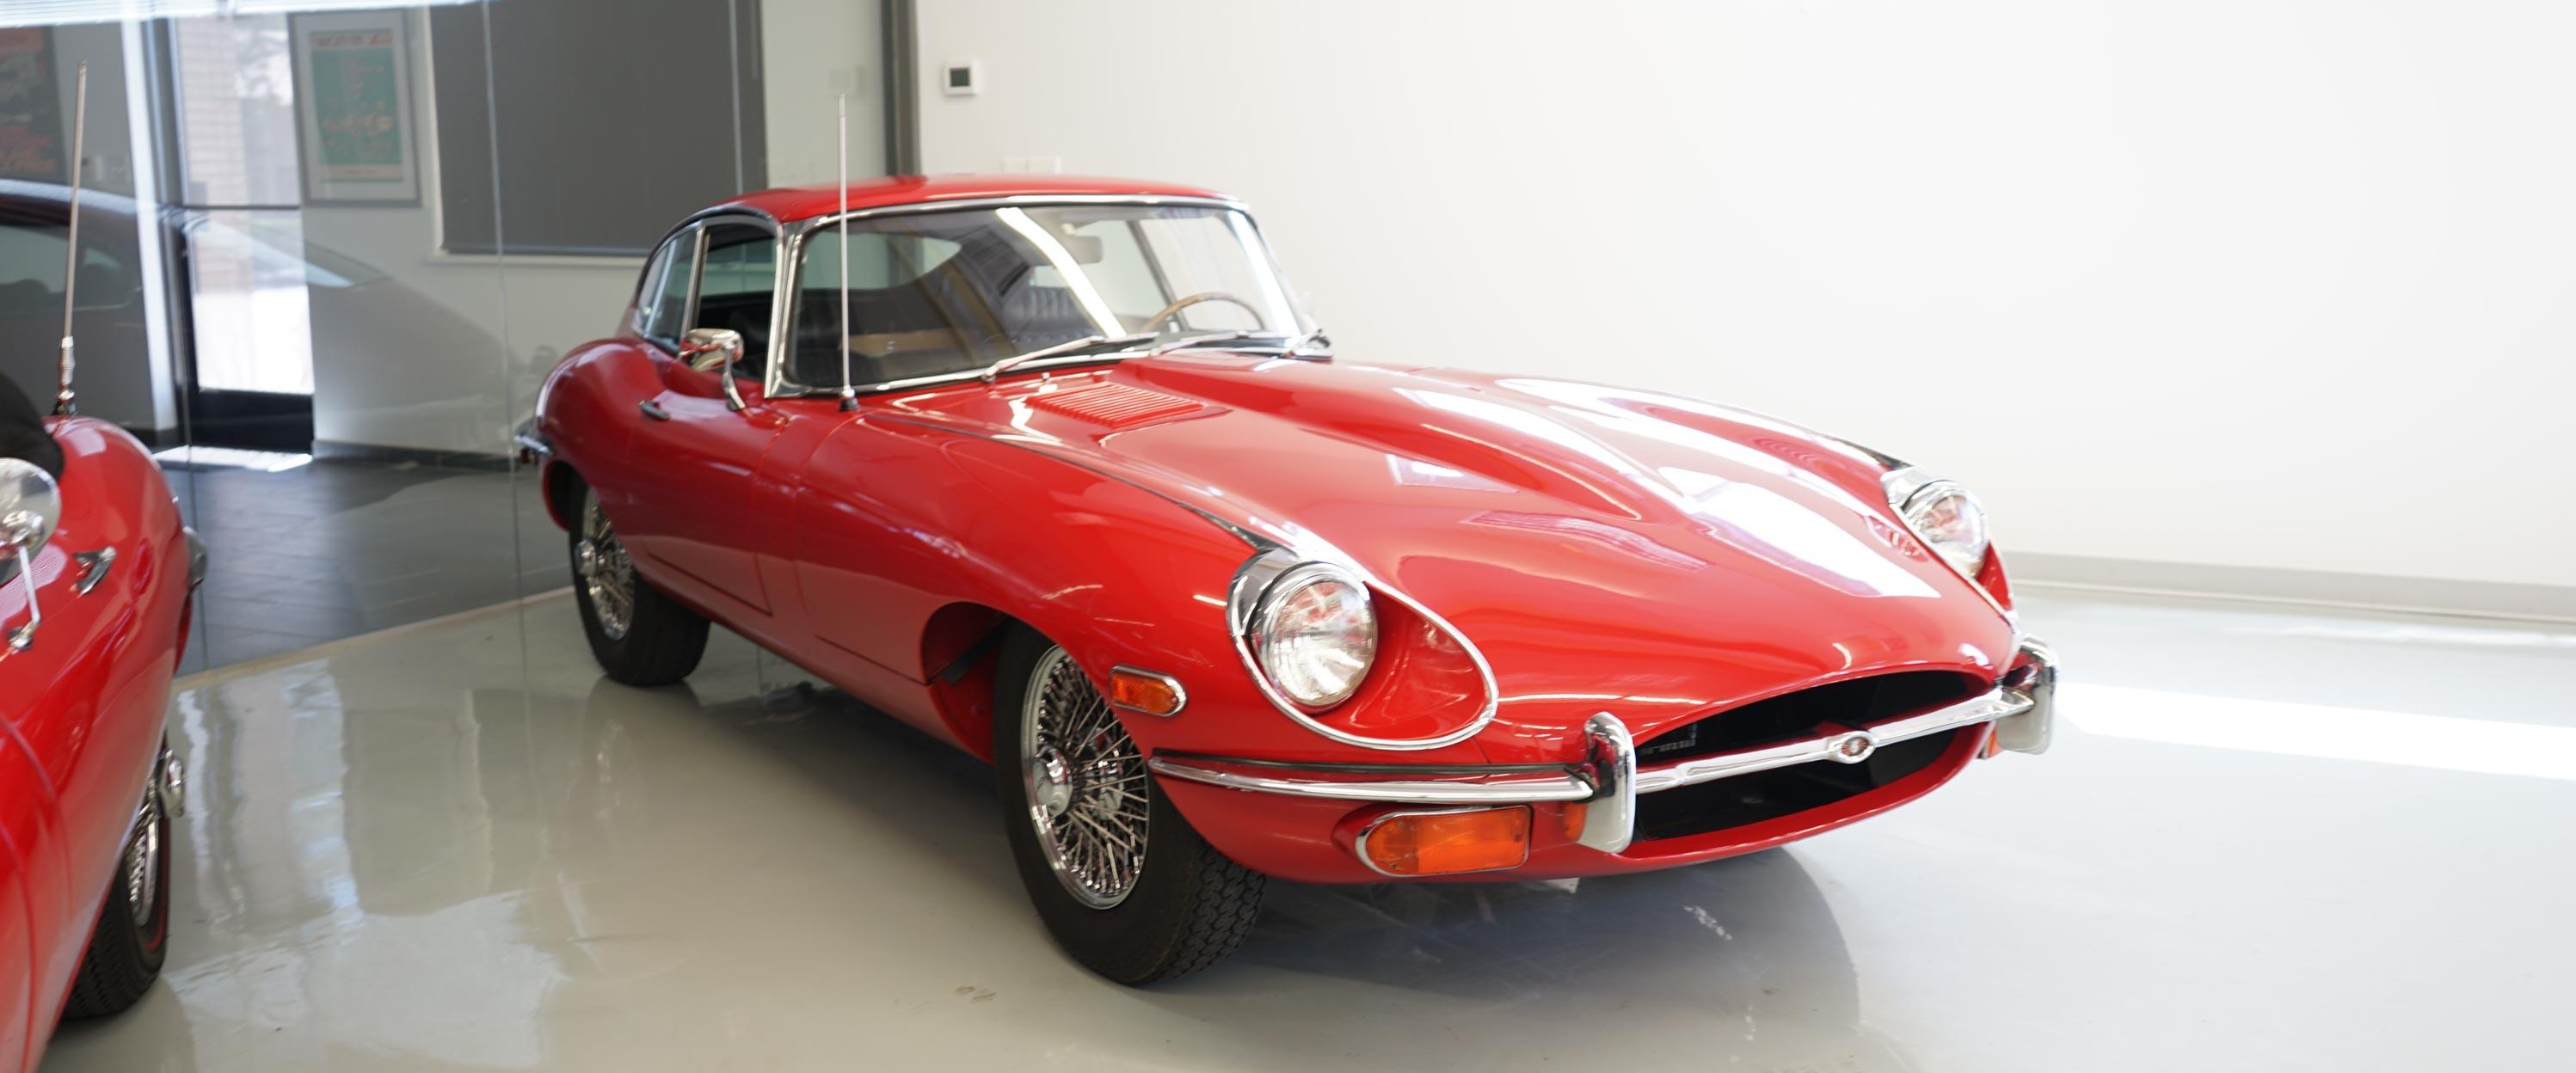 1968-Jaguar-XKE-Coupe-Red-slideshow-002@2x.jpg